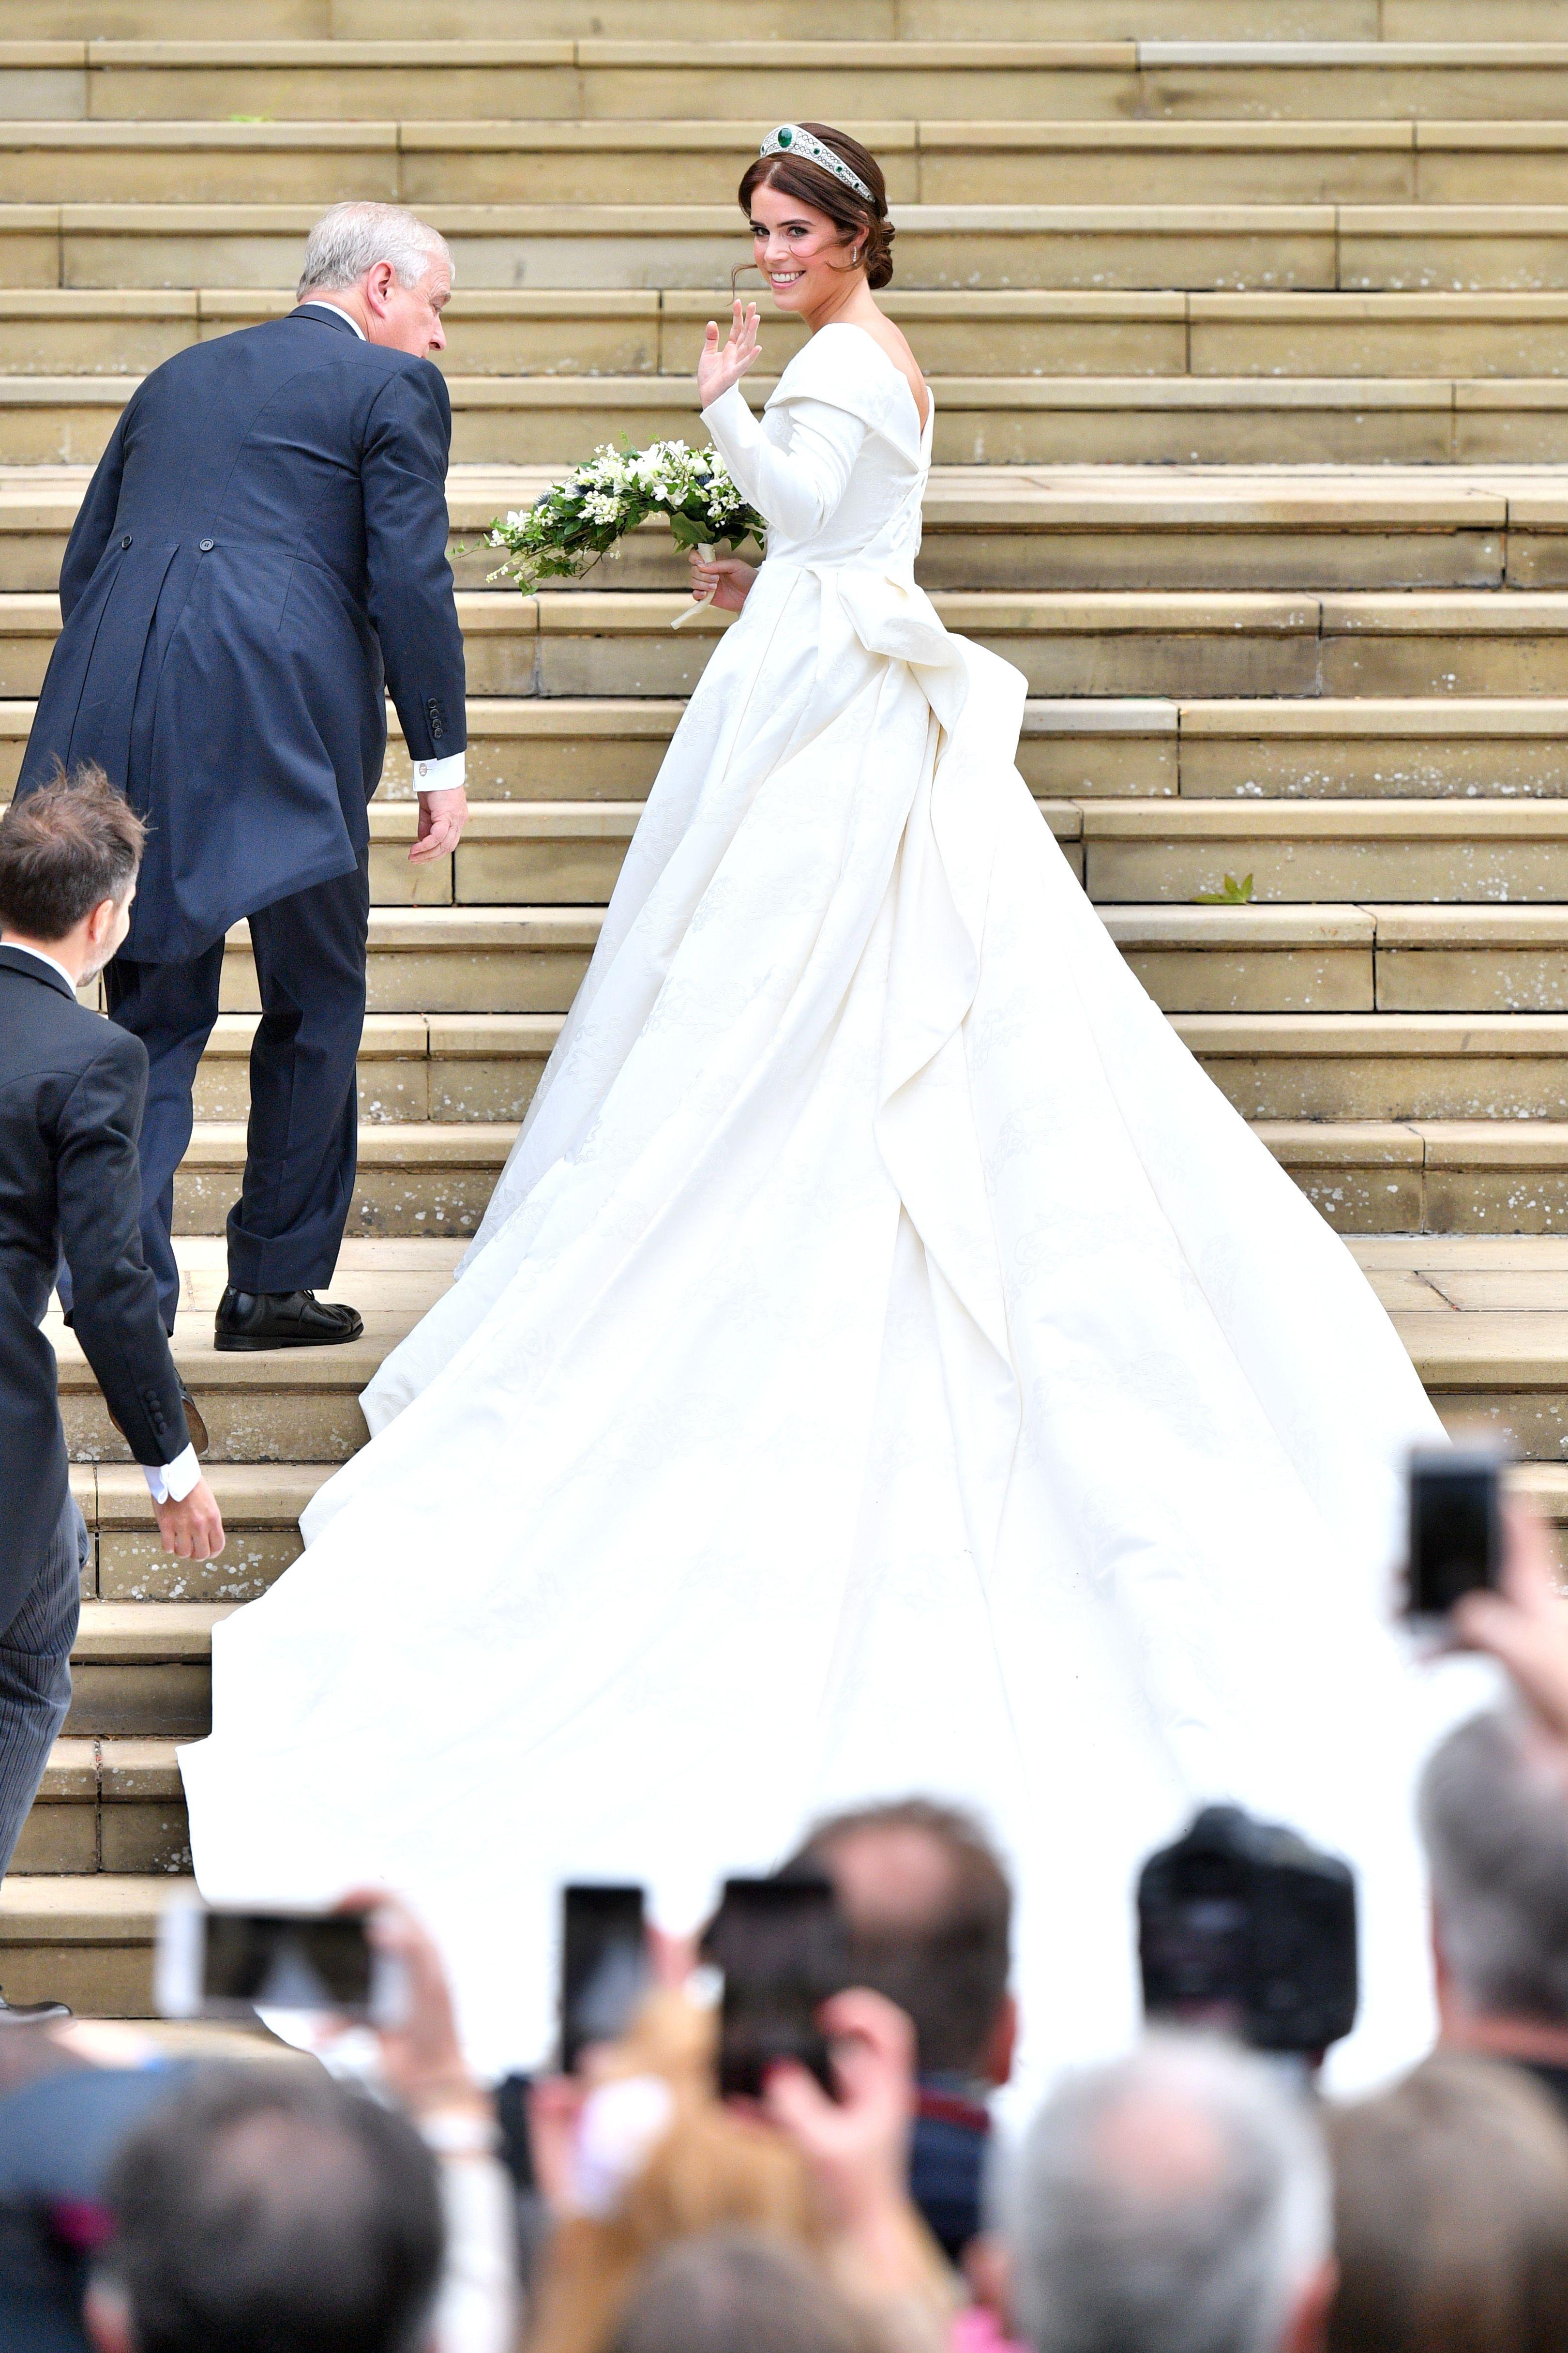 Princess Eugenies Wedding Dress Compared To Meghan Markle